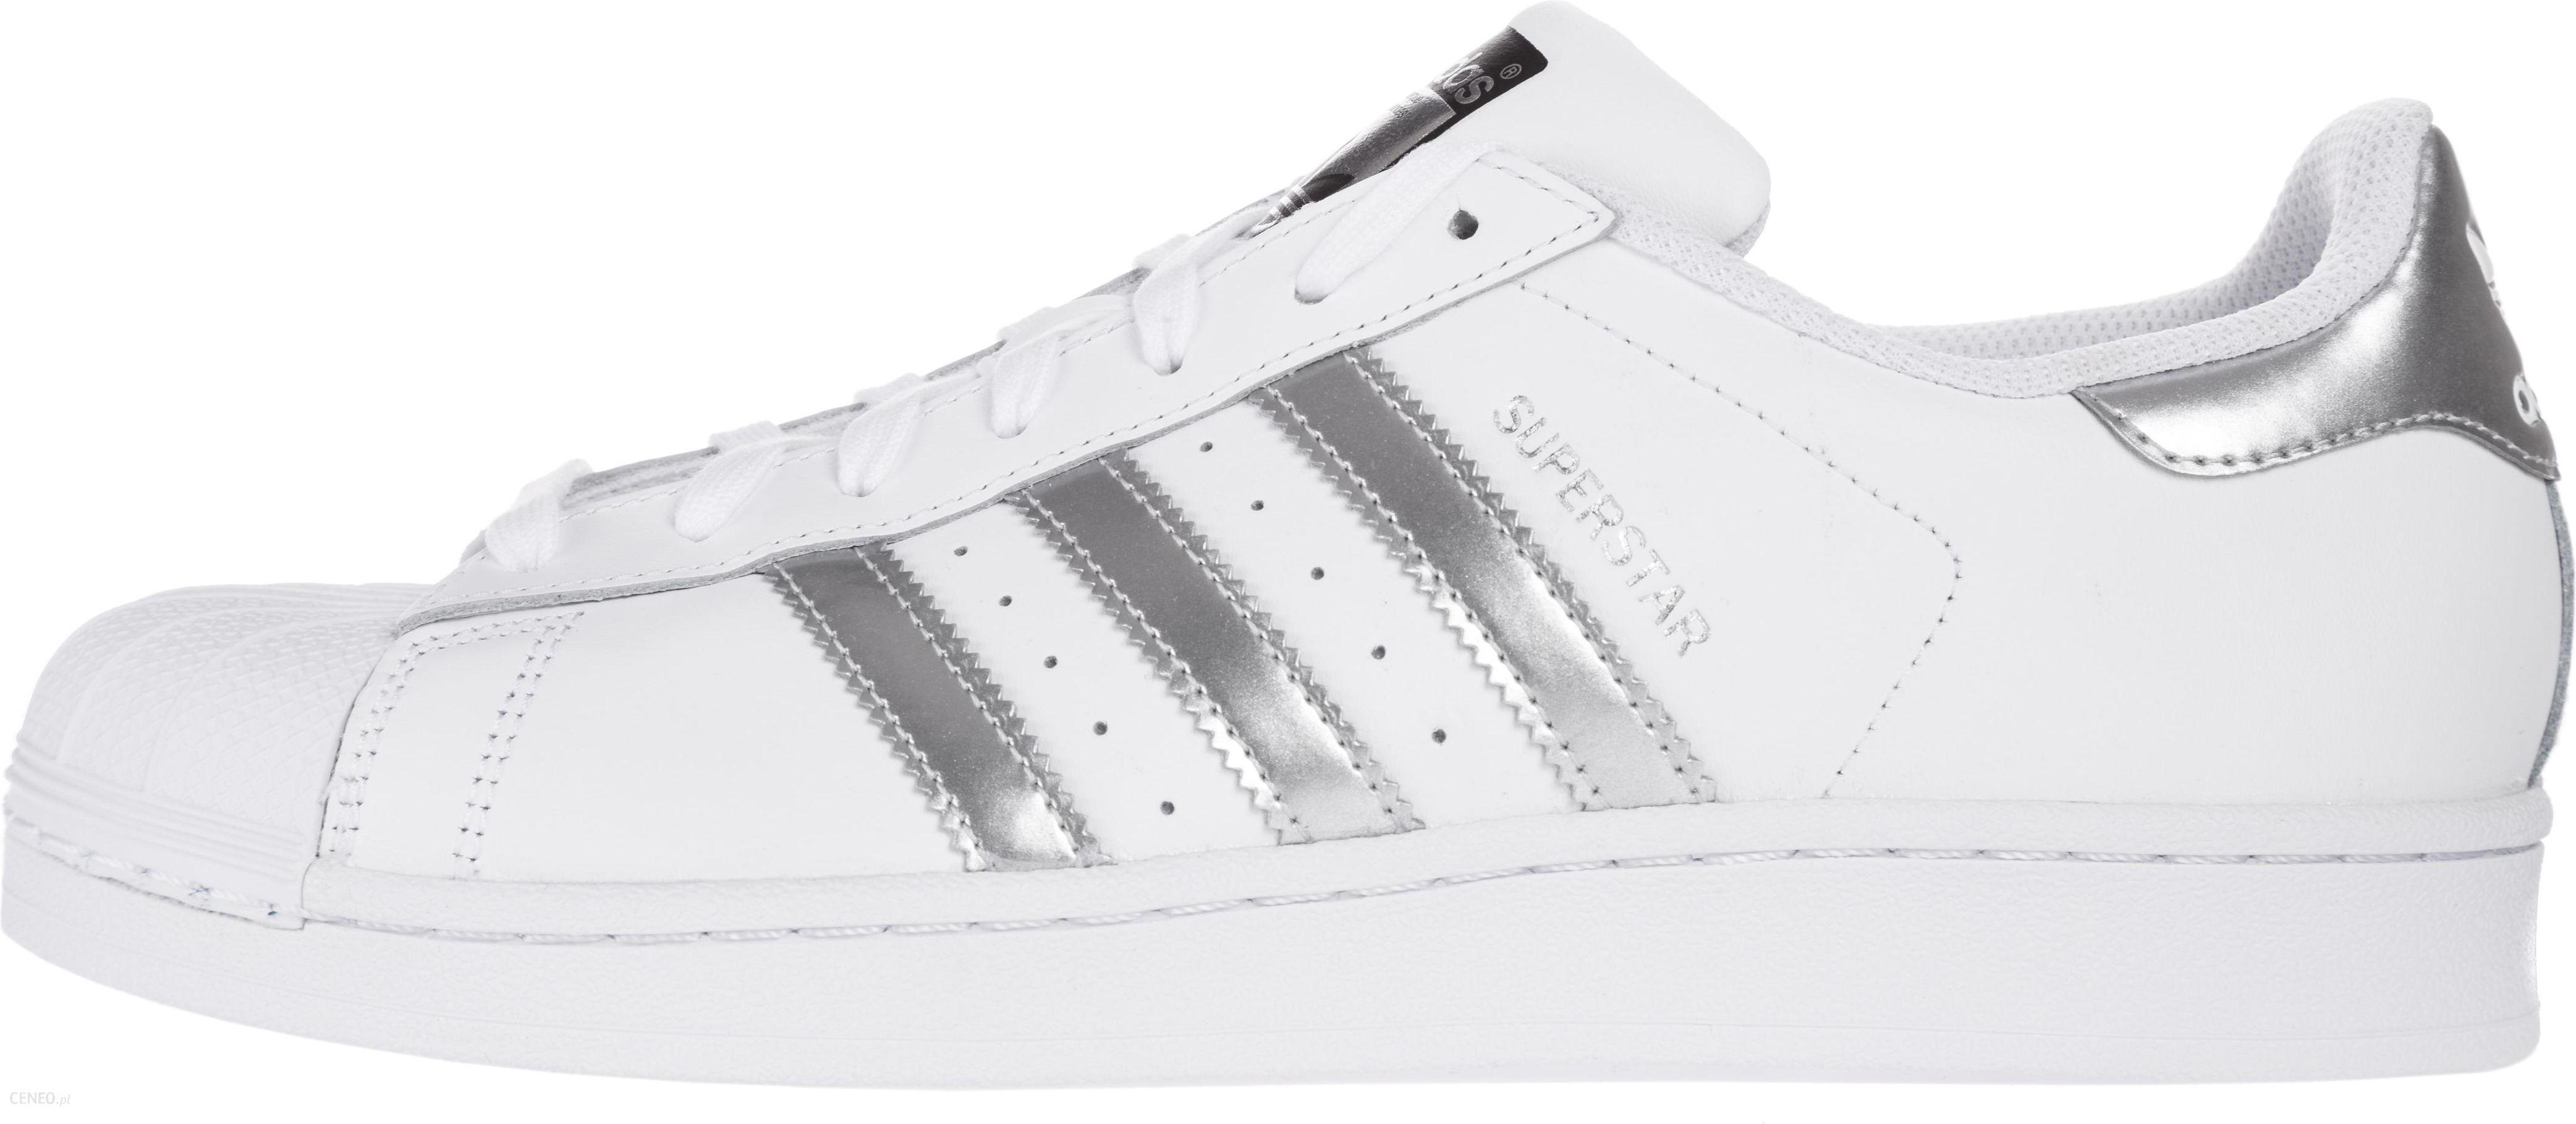 Adidas Originali Superstar Bia Ł Y 38 Ceny Mi Opinie